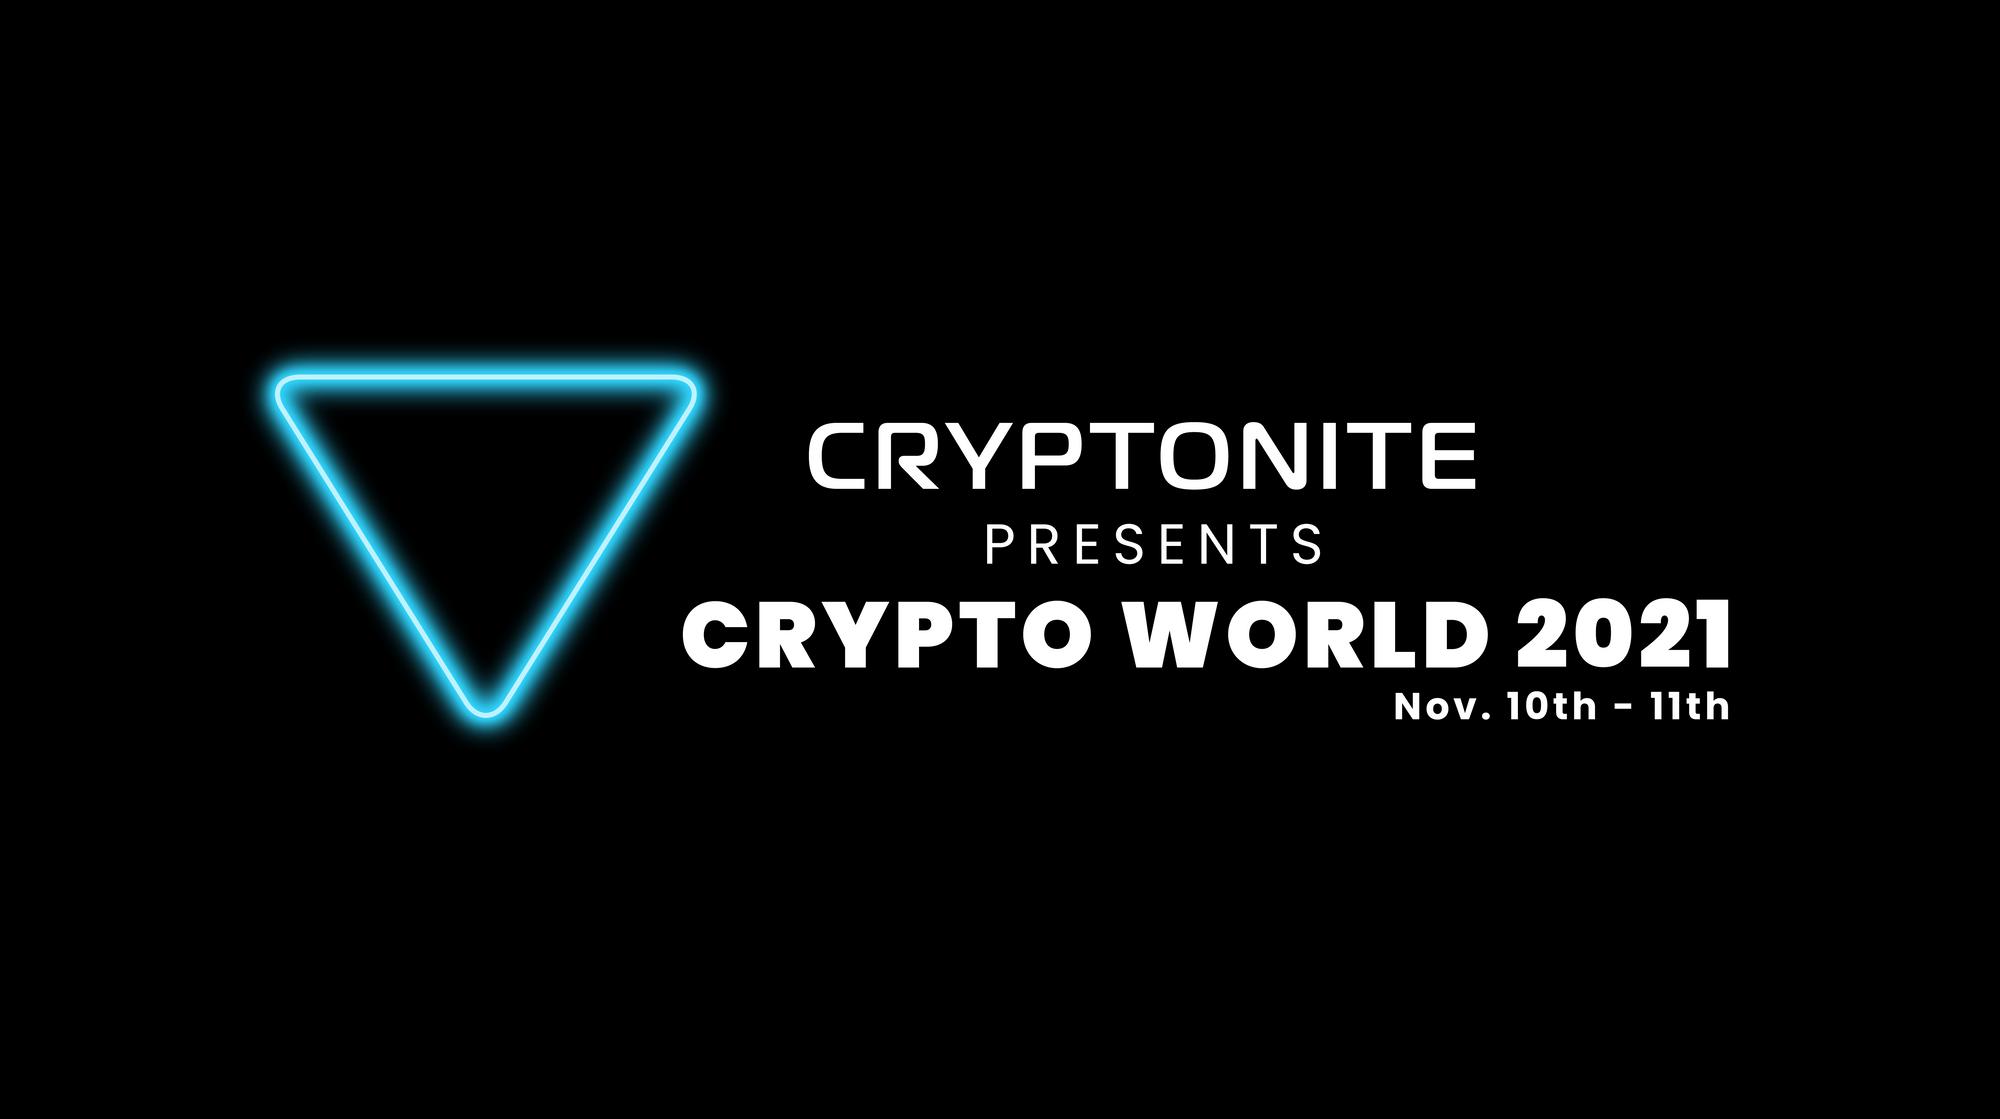 Cyrptonite-Presents-Crypto-World-BLK-BG